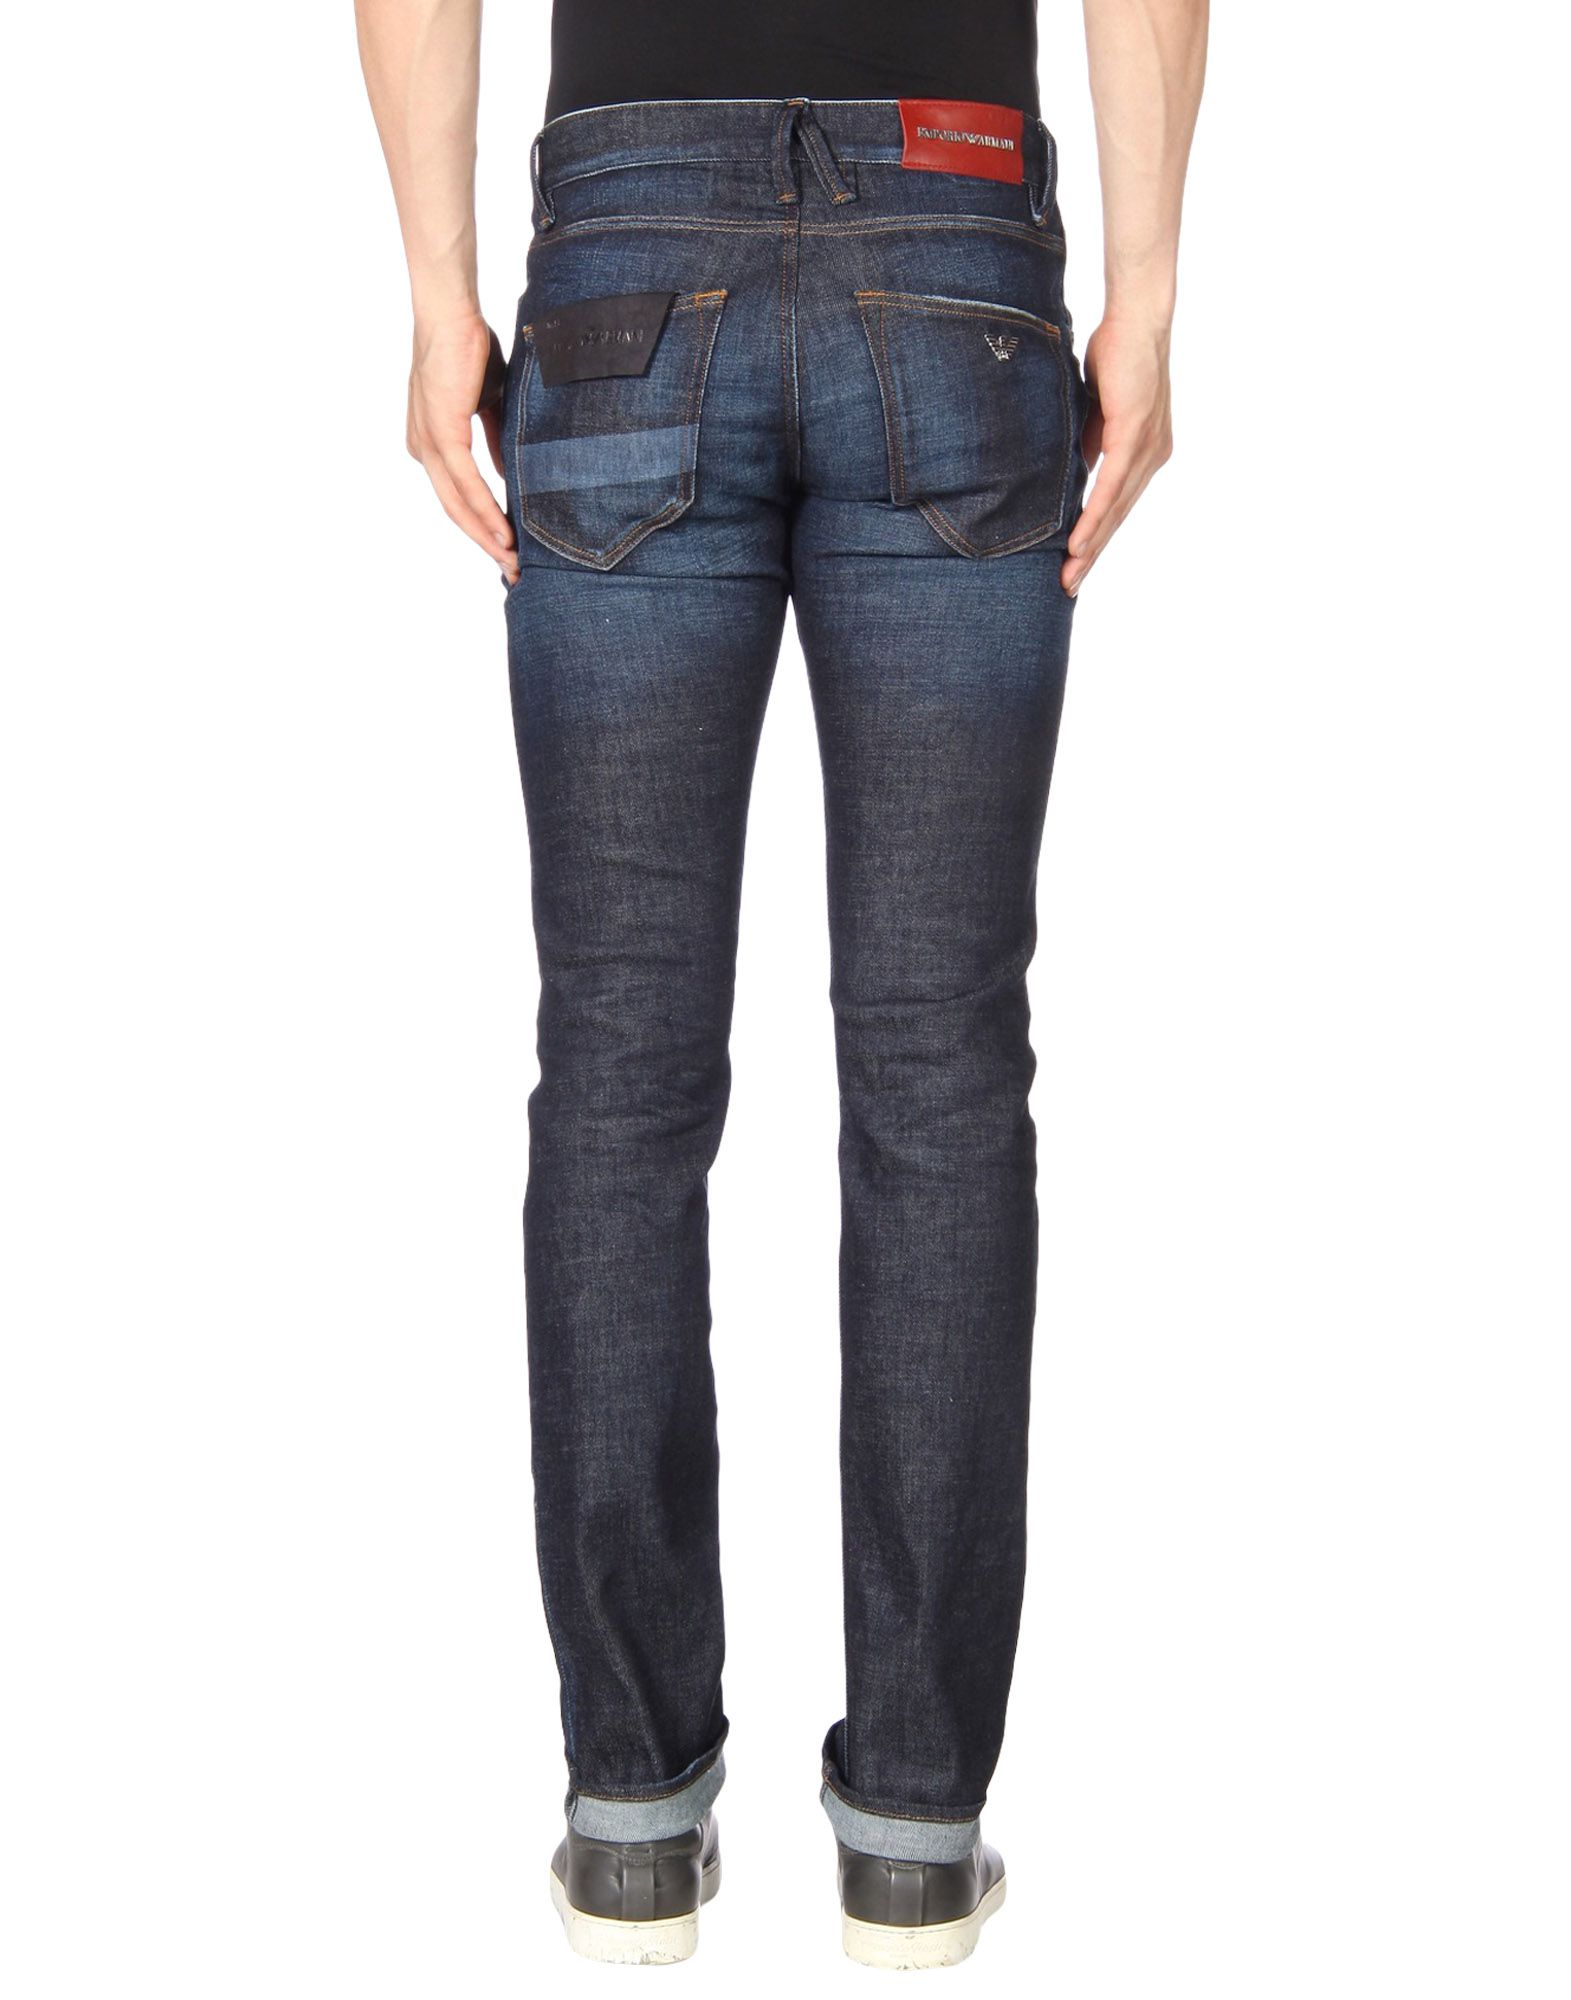 Pantaloni Jeans Emporio Armani Uomo - - Uomo 42588622JK cc65c4